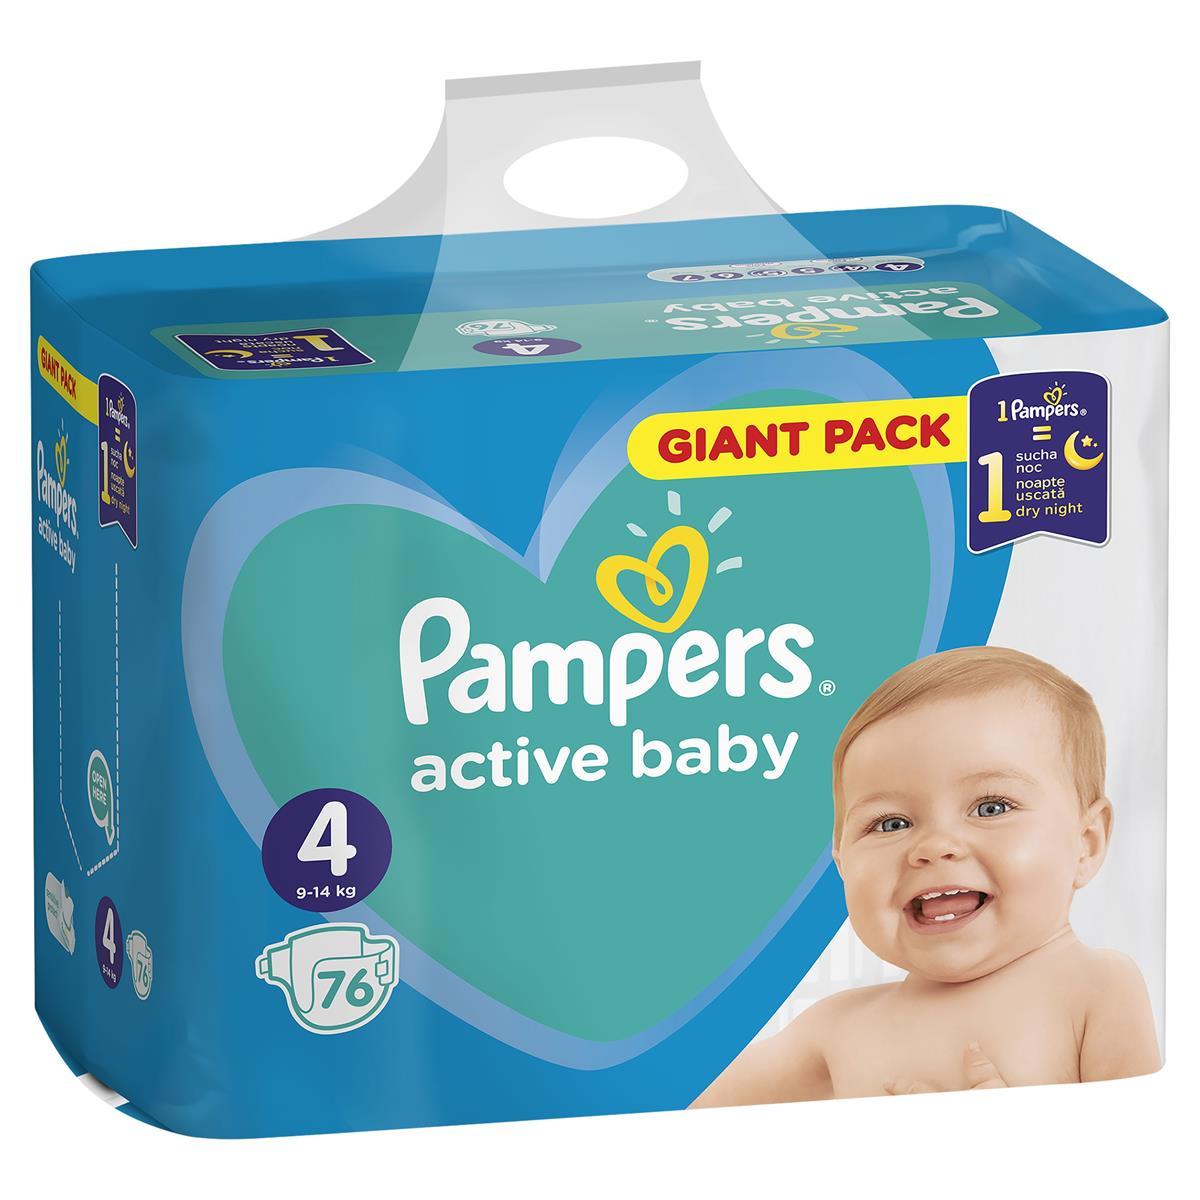 Pampers active baby 76ks plenkové kalhotky Maxi 9-14kg